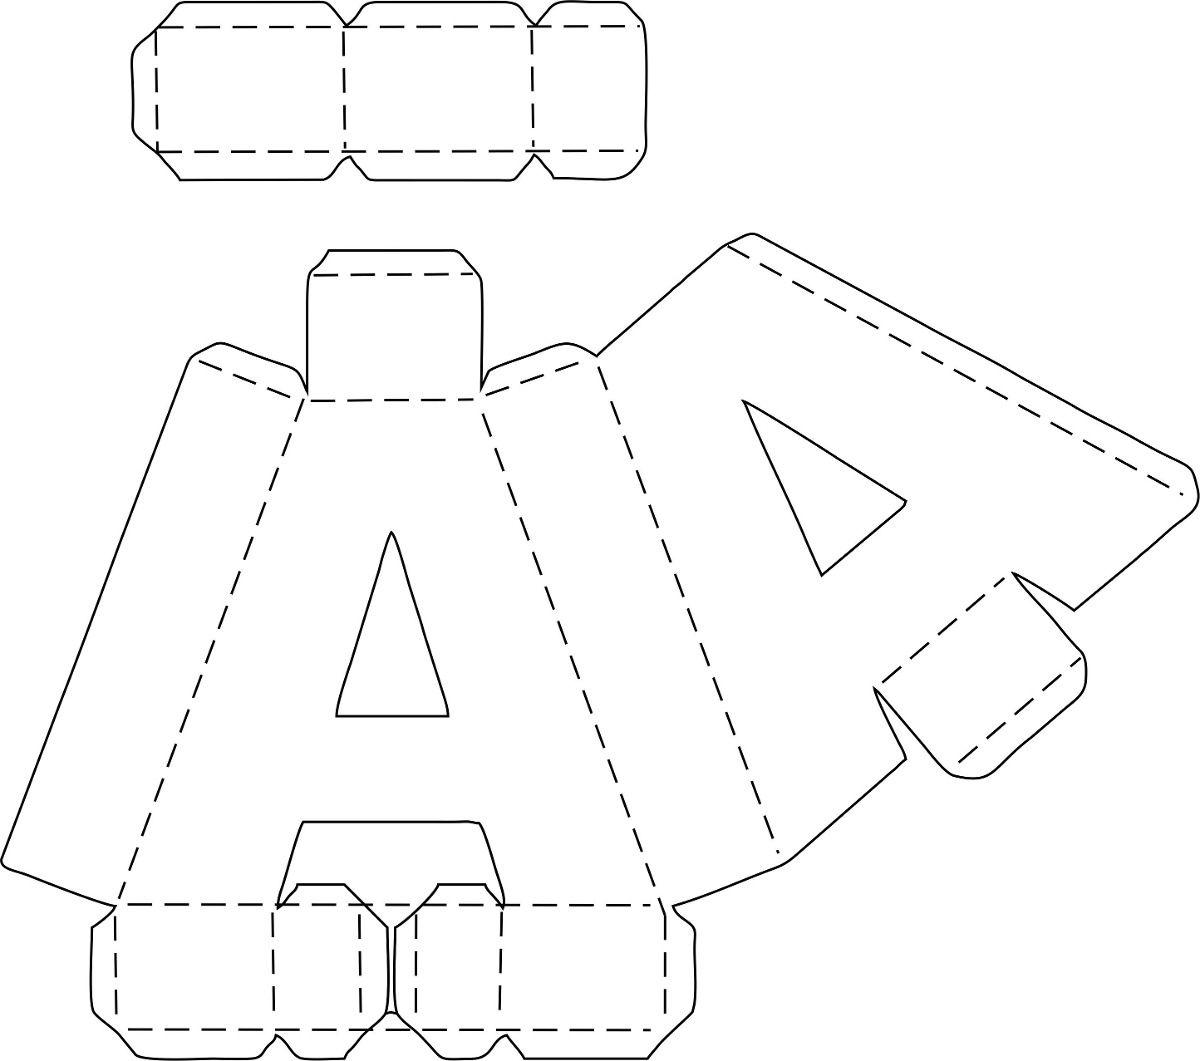 Image image origami alphabet letters origami alphabet instructions - 1 Letras 3d Corte Manual Formatos Png Sgv Pdf E